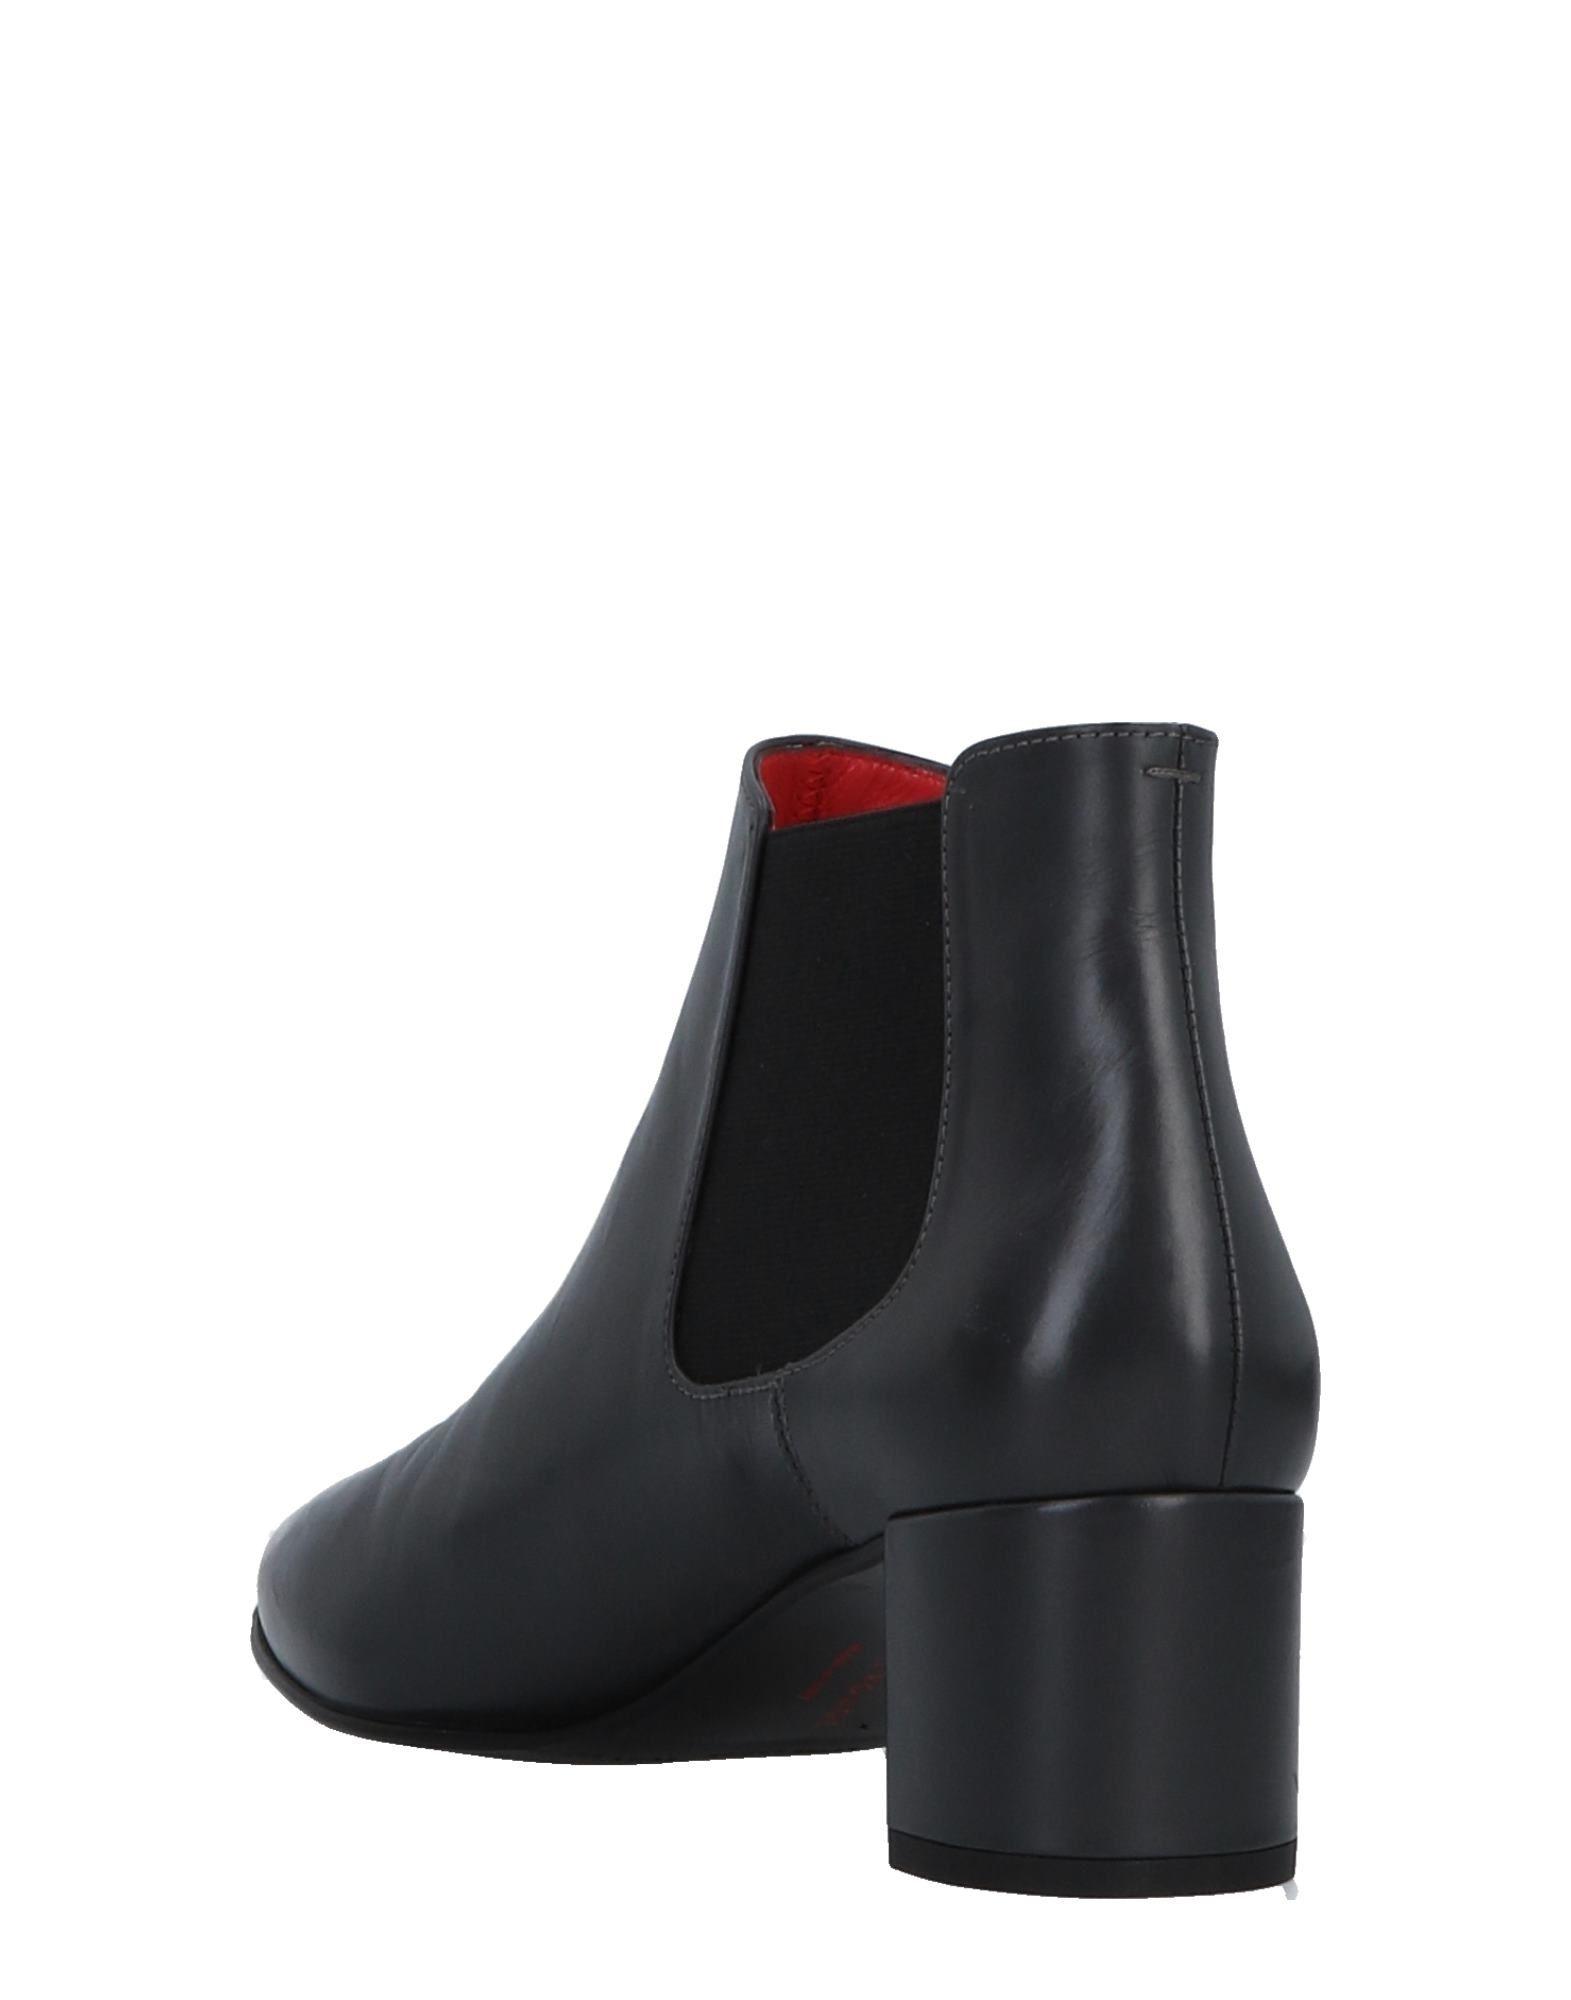 Pas De strapazierfähige Rouge Stiefelette Damen  11513006SXGut aussehende strapazierfähige De Schuhe 650bcb